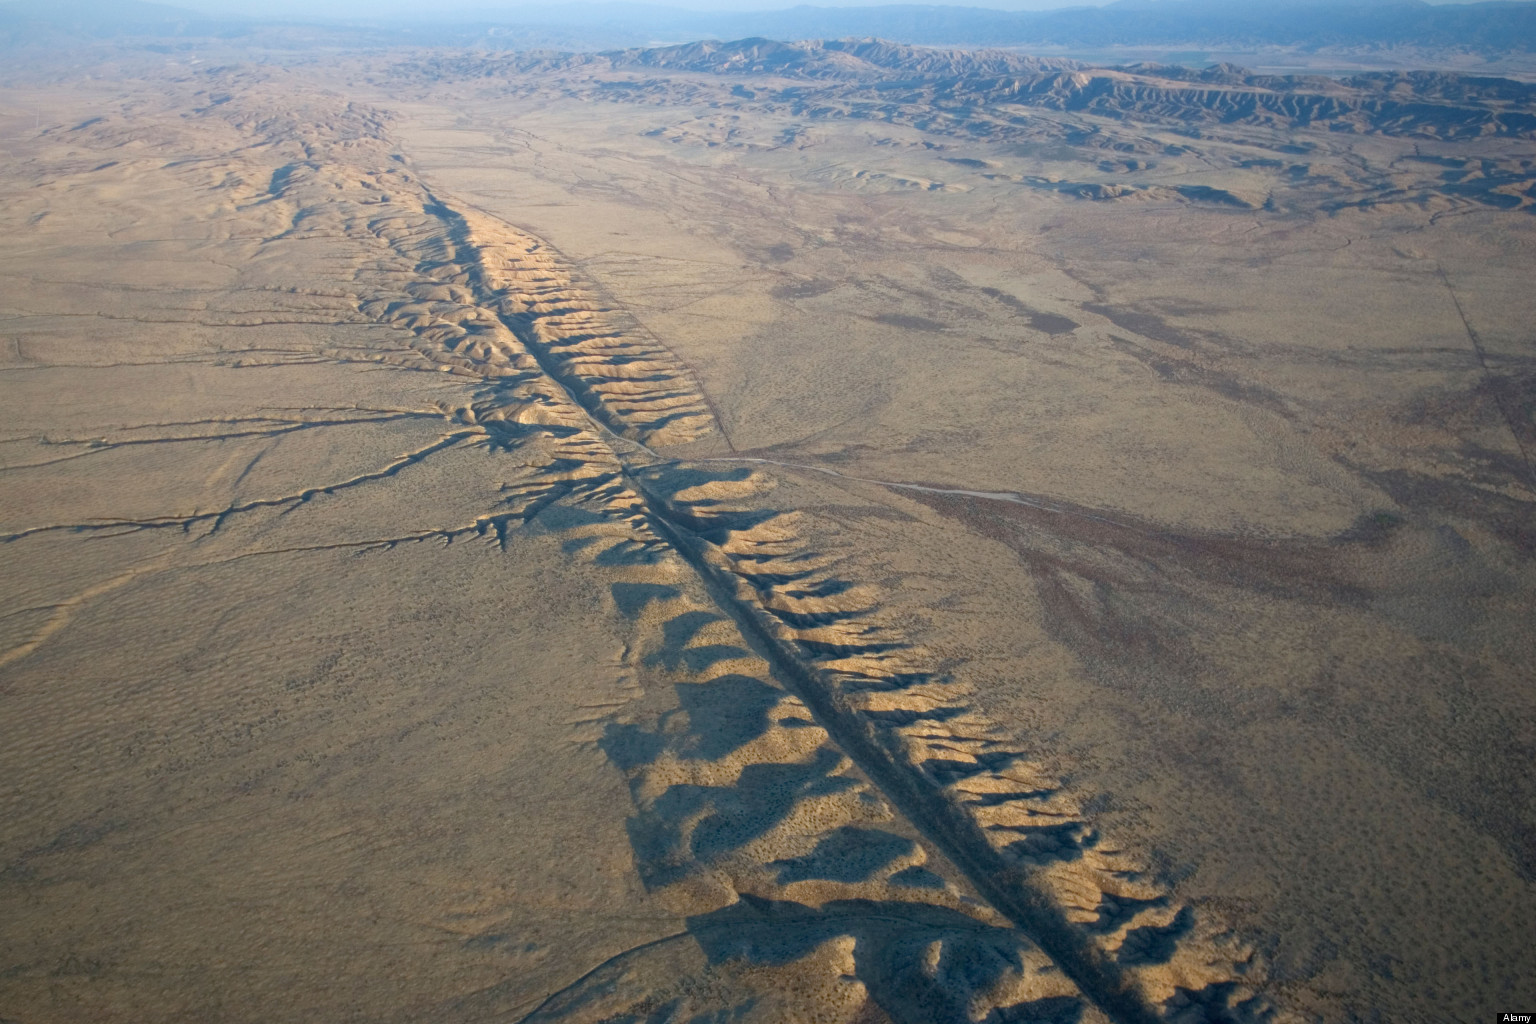 FALLAS BLOQUE 3 San-francisco-fault